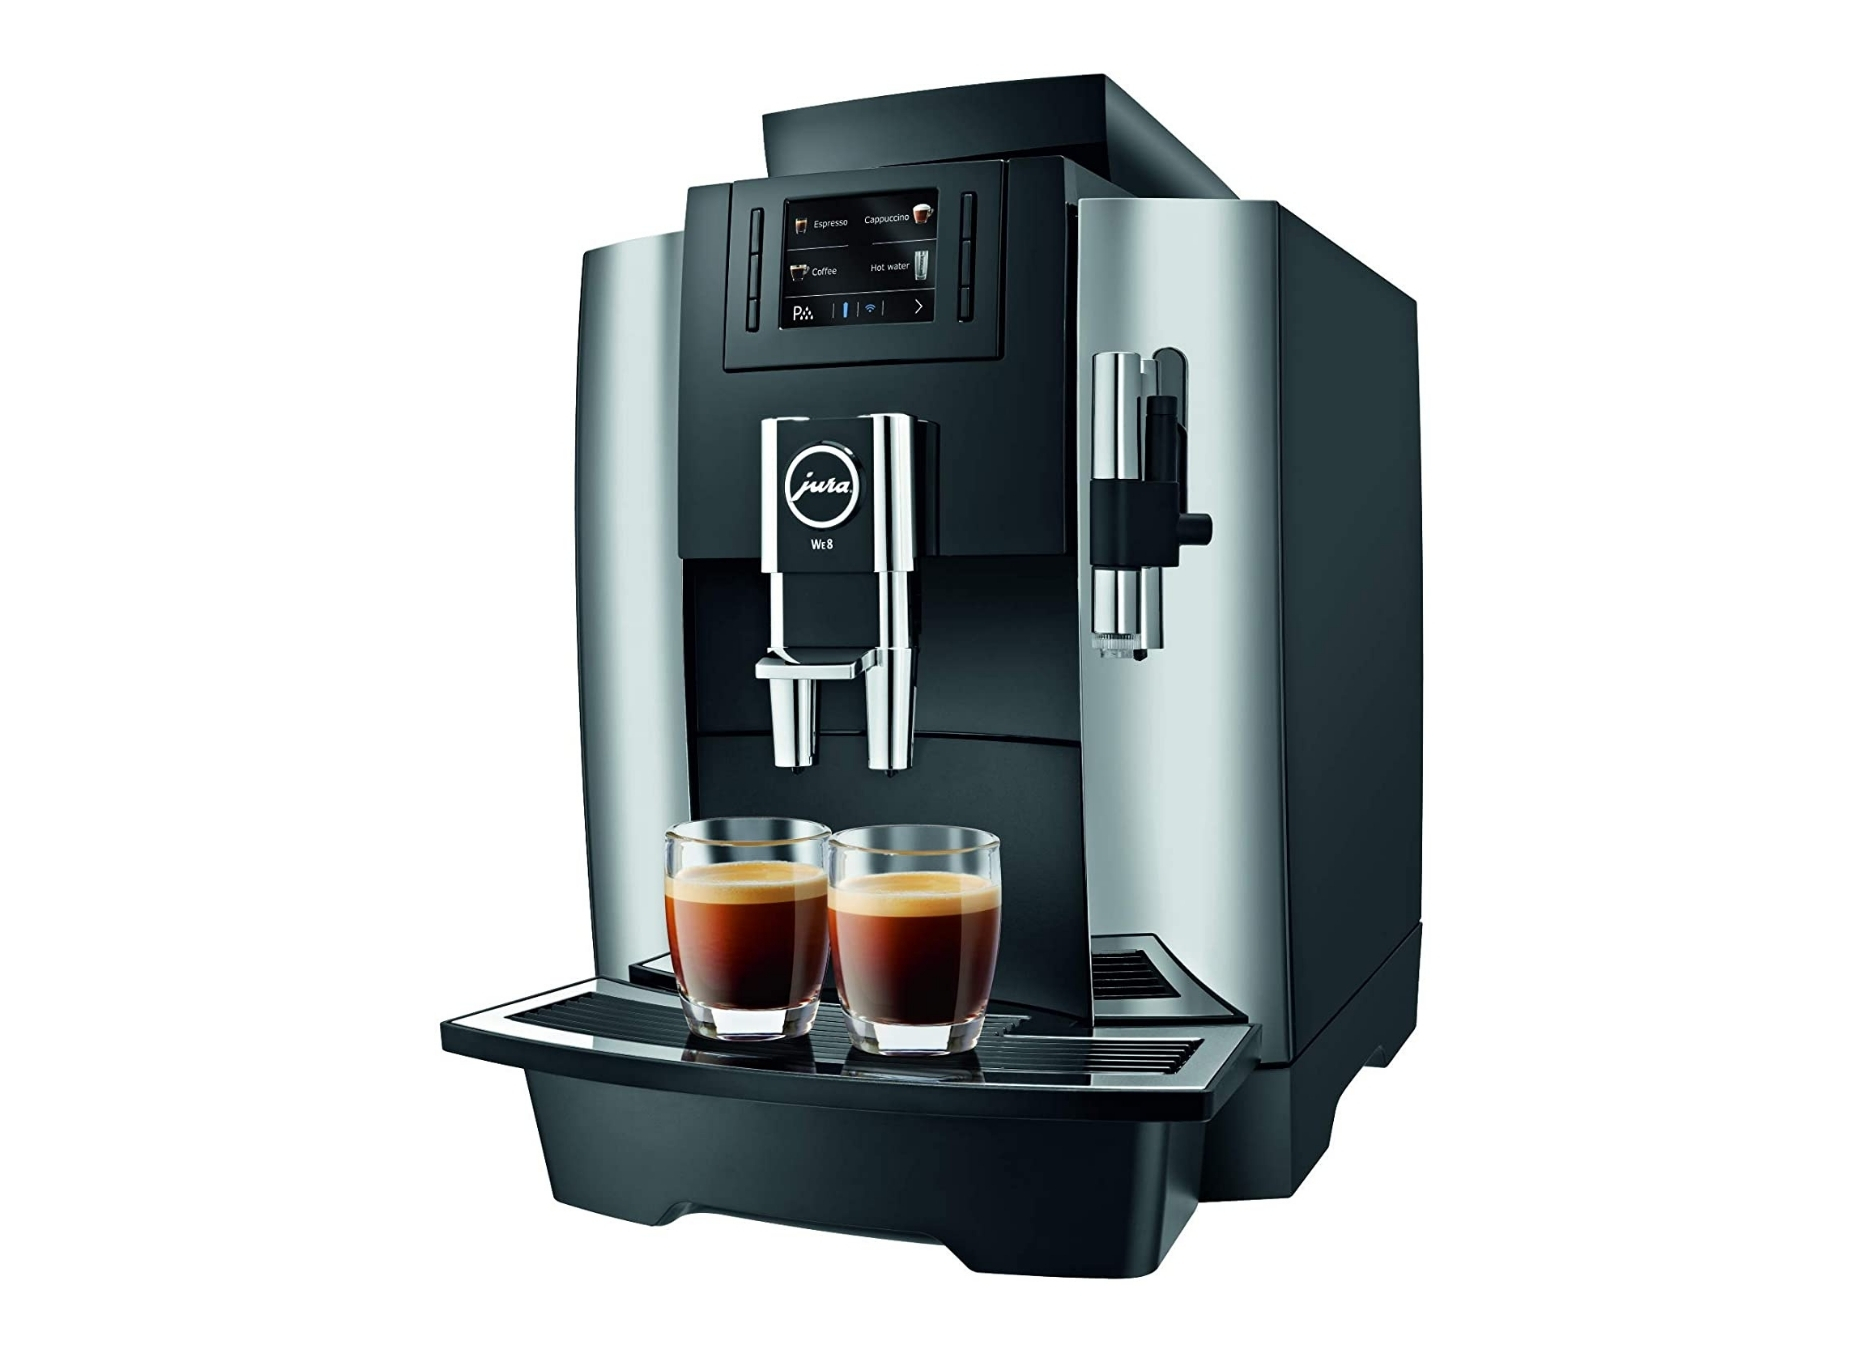 Jura Coffee Maker